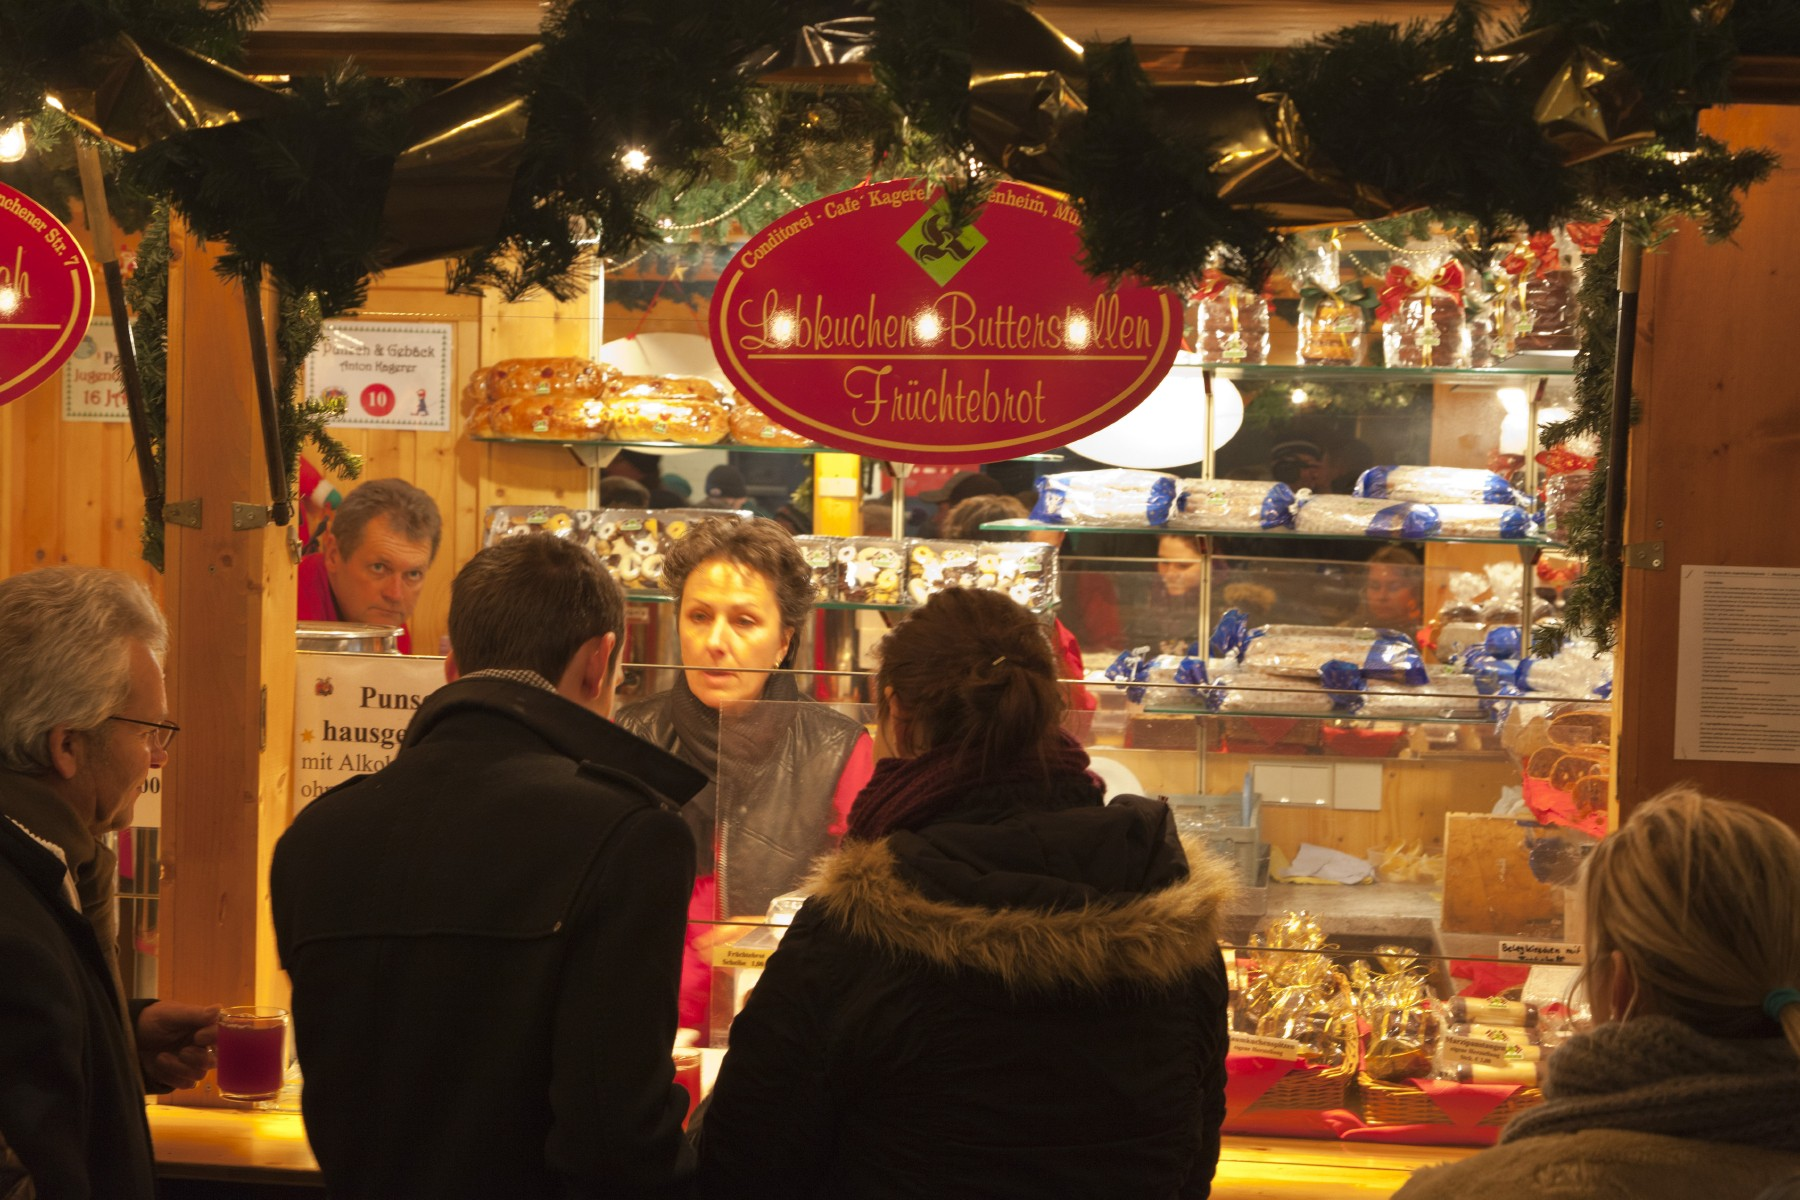 christkindlmarkt-rosenheim-winter-verkaufsstand-weihnachten.jpg